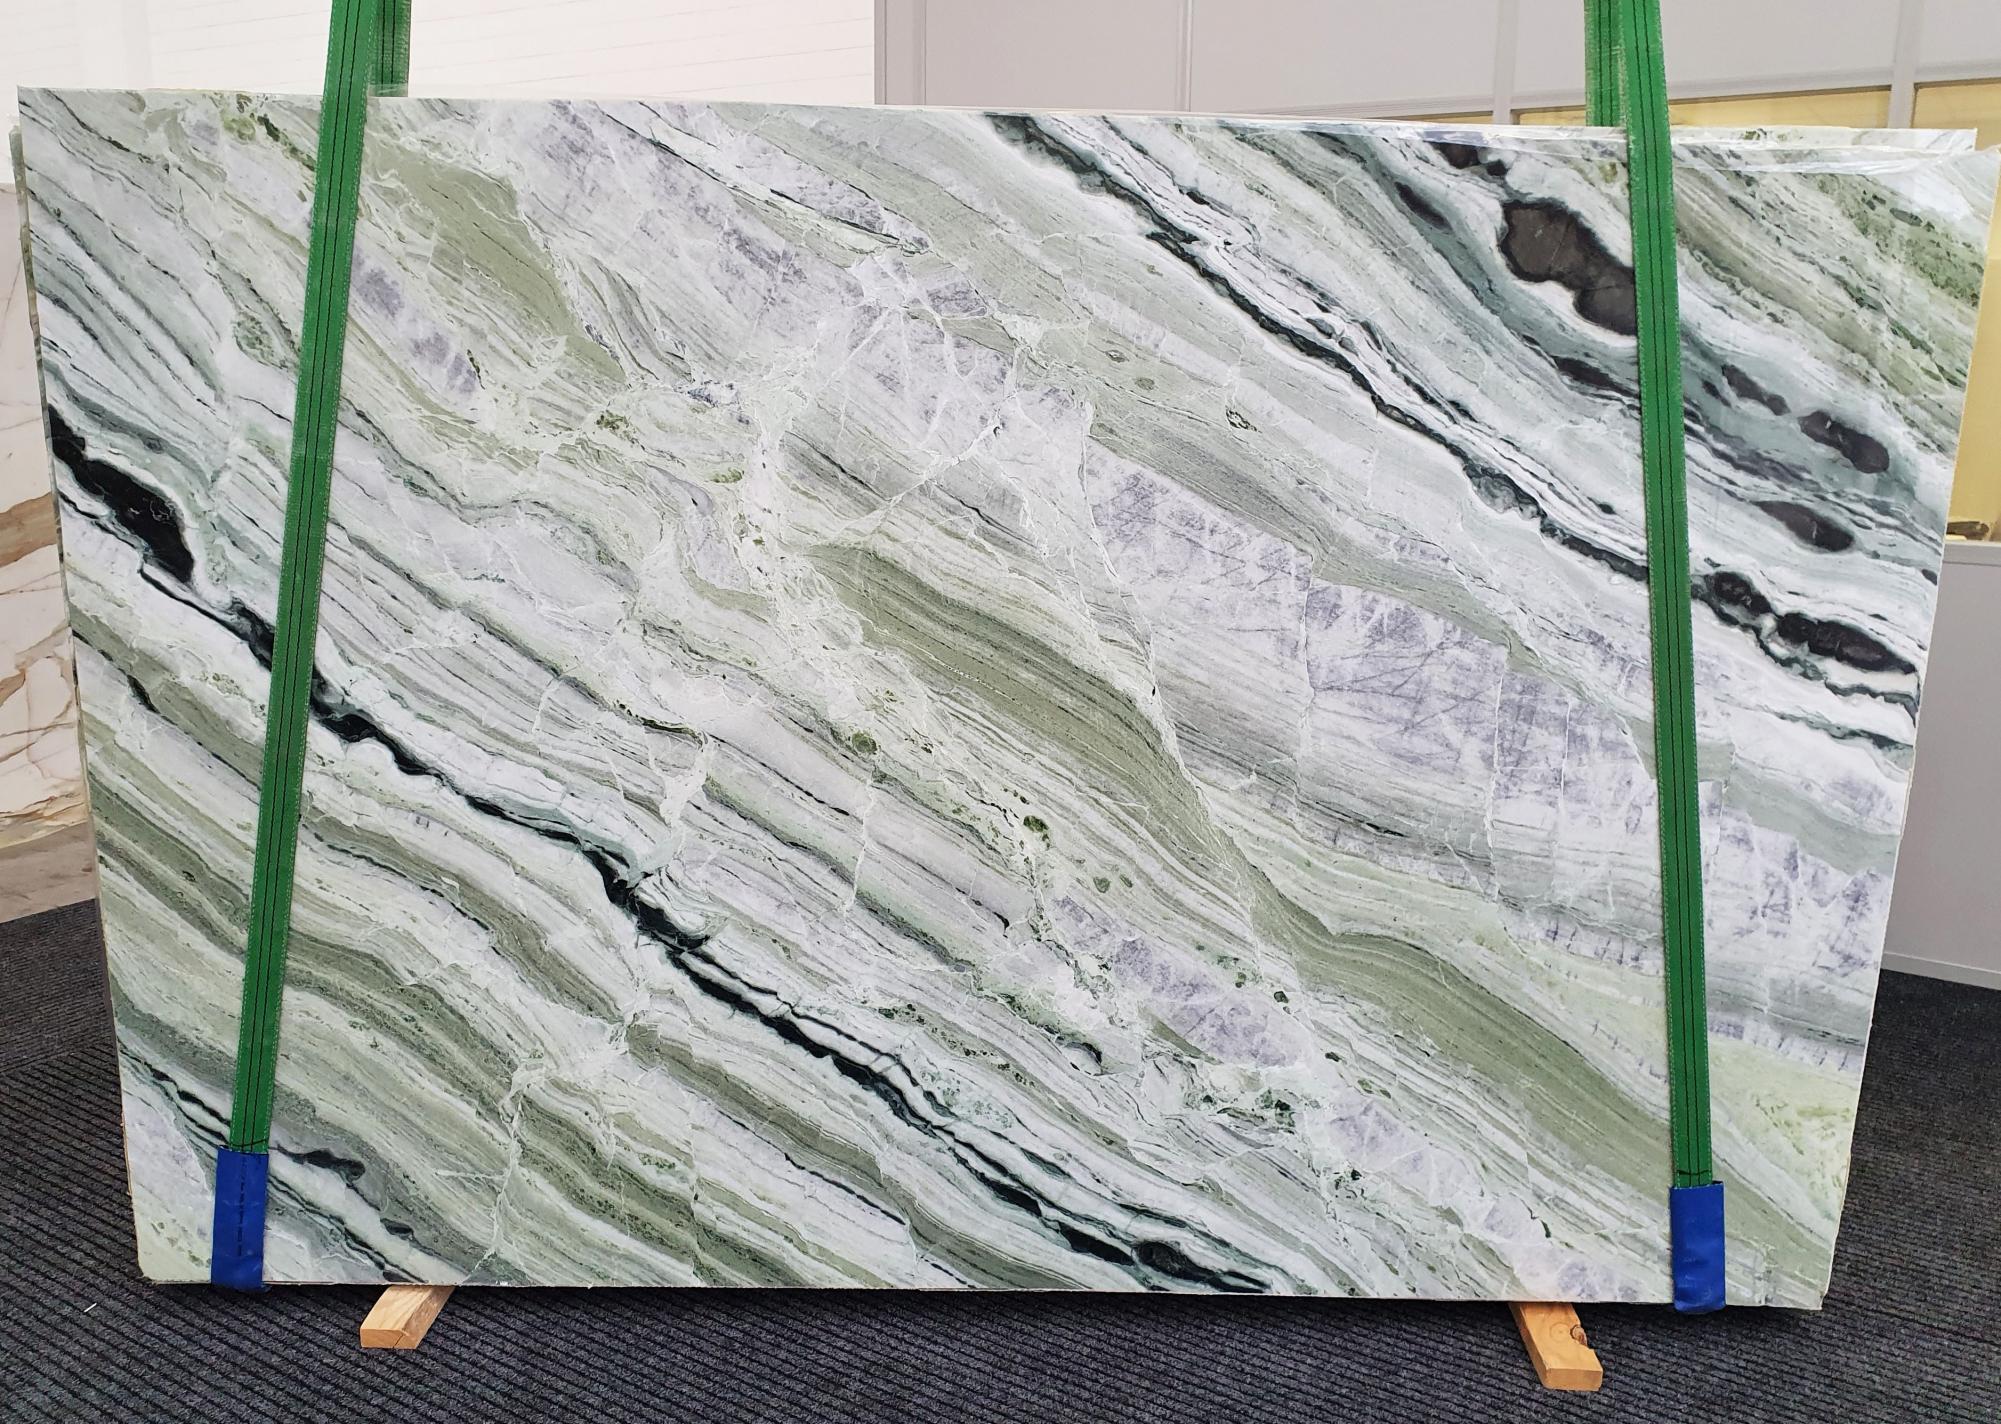 GREEN BEAUTY polierte Unmaßplatten 1452 aus Natur Marmor , Slab #01: Lieferung Veneto, Italien